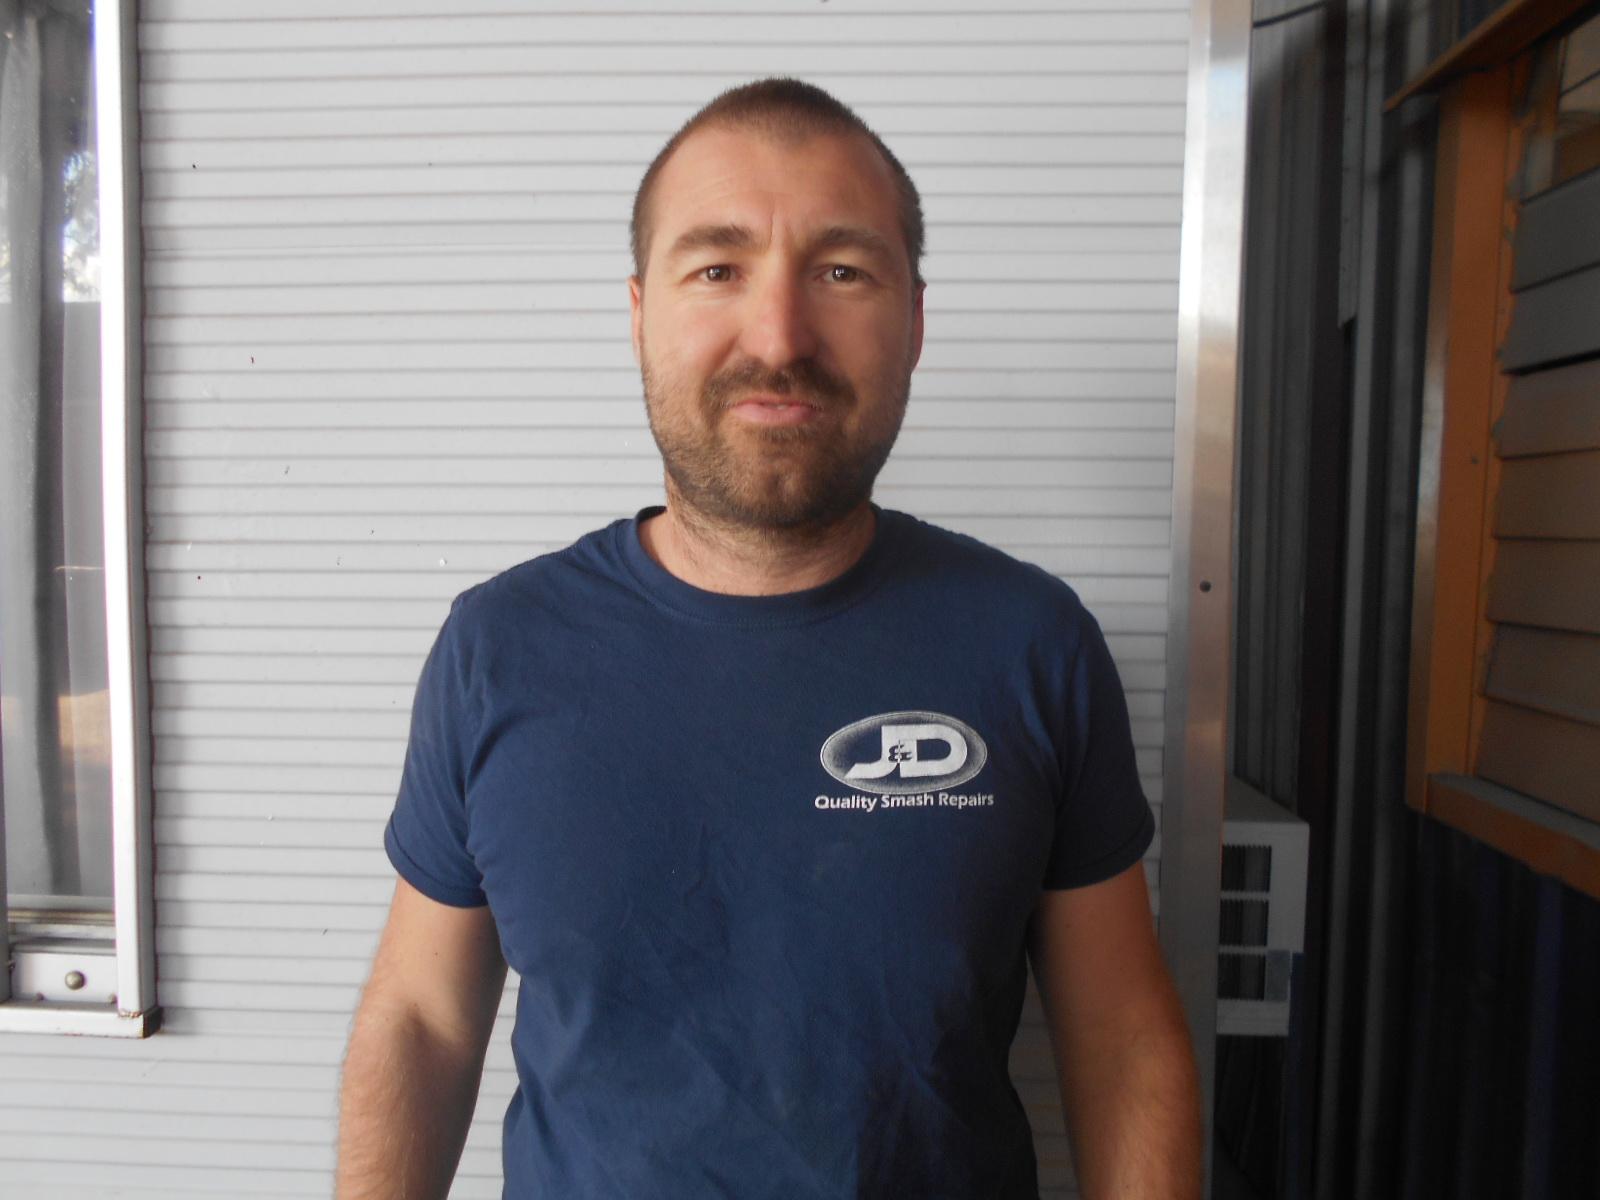 Juan's profile picture